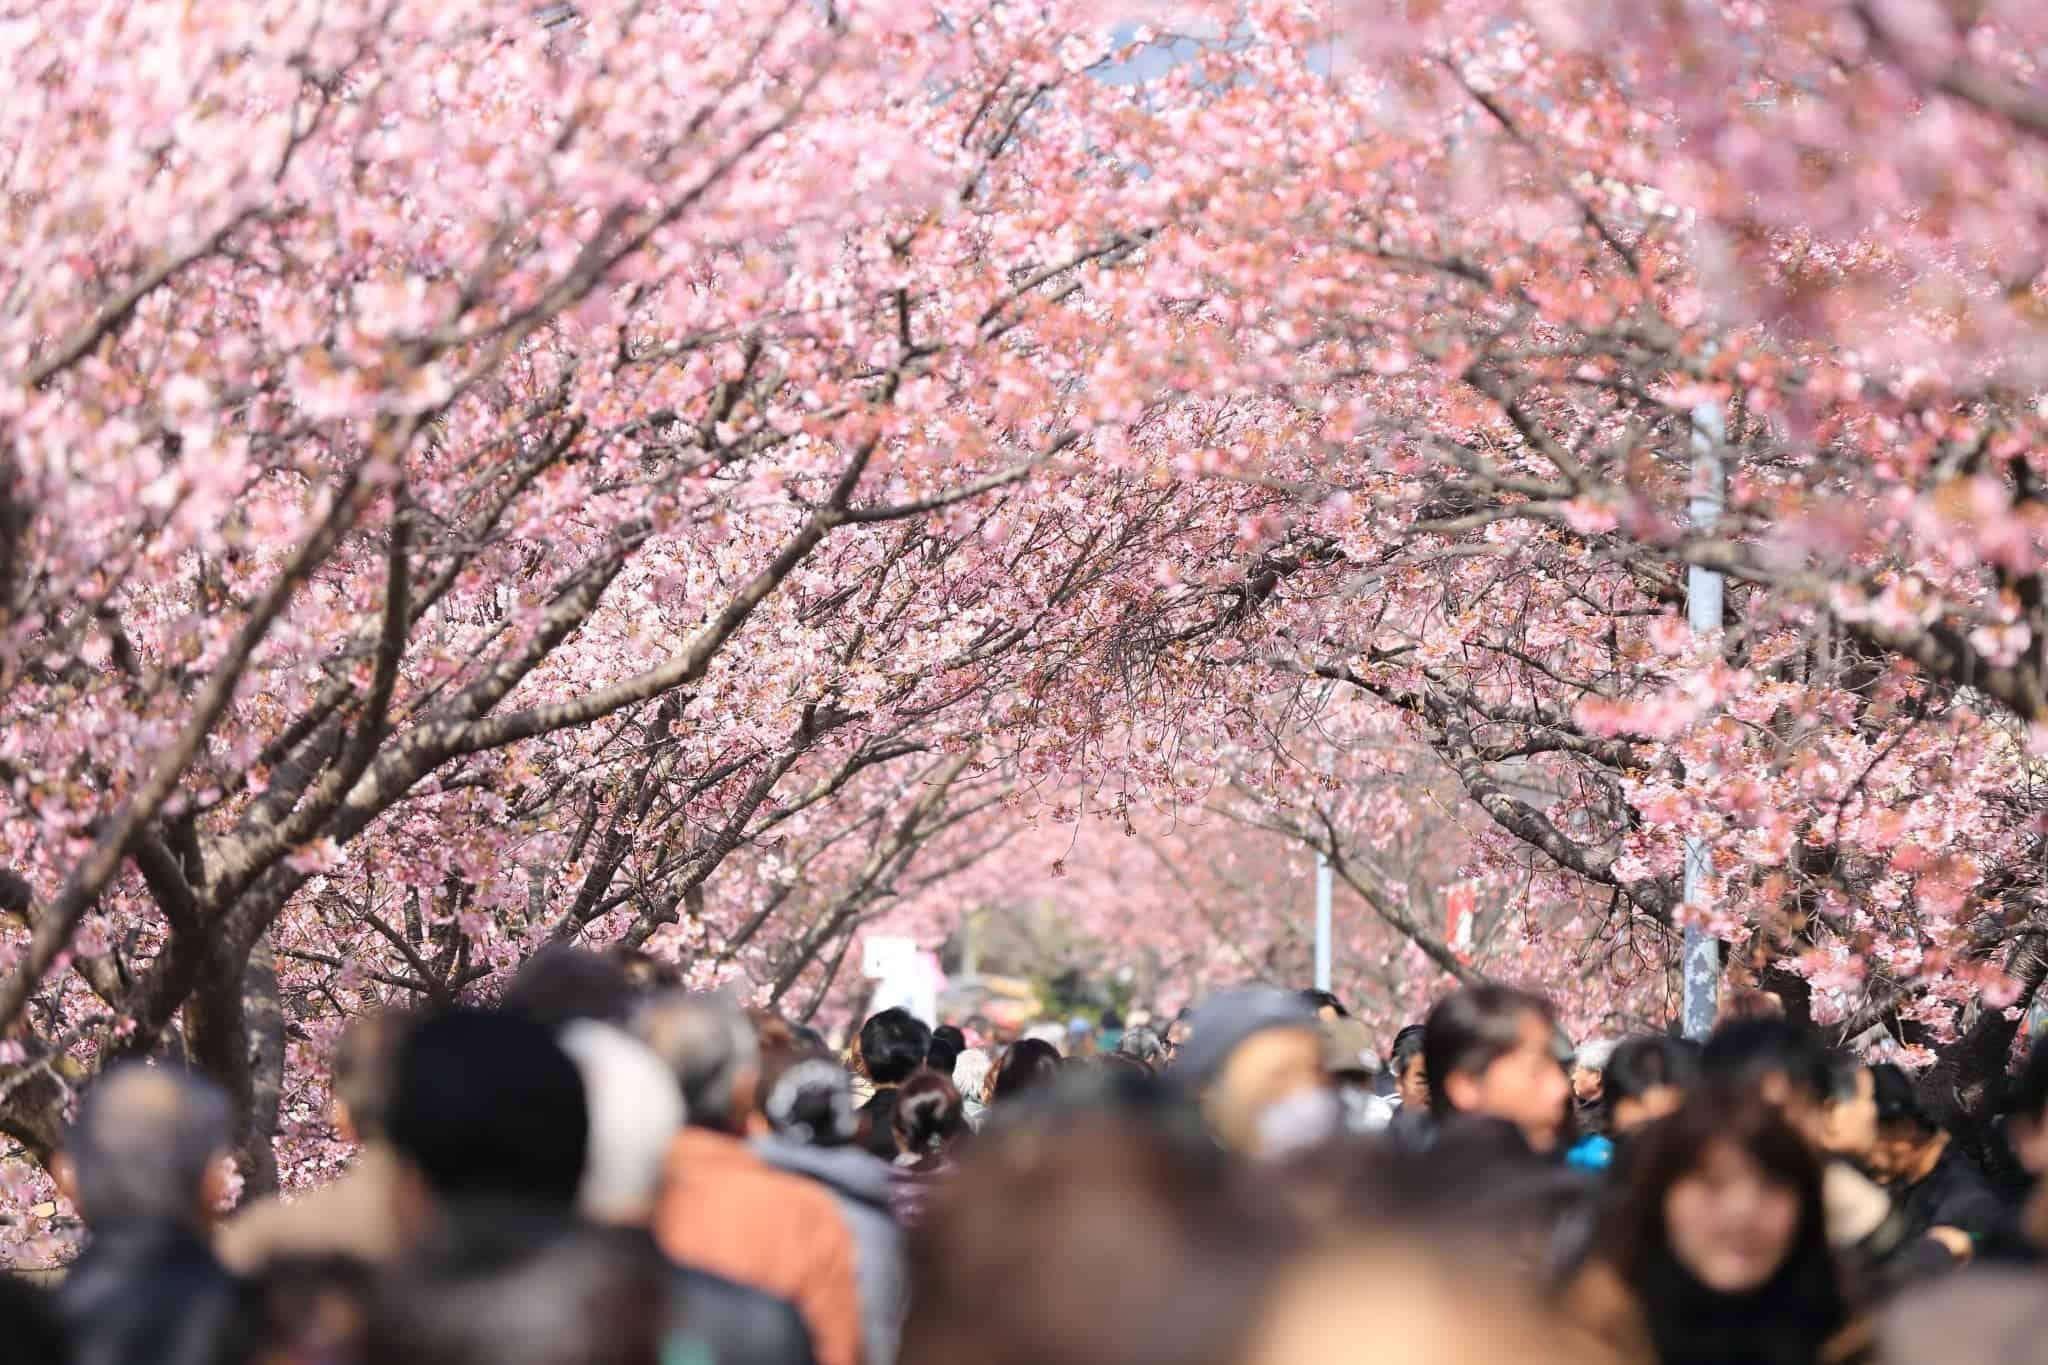 cherry blossoms in Washington flower tourism